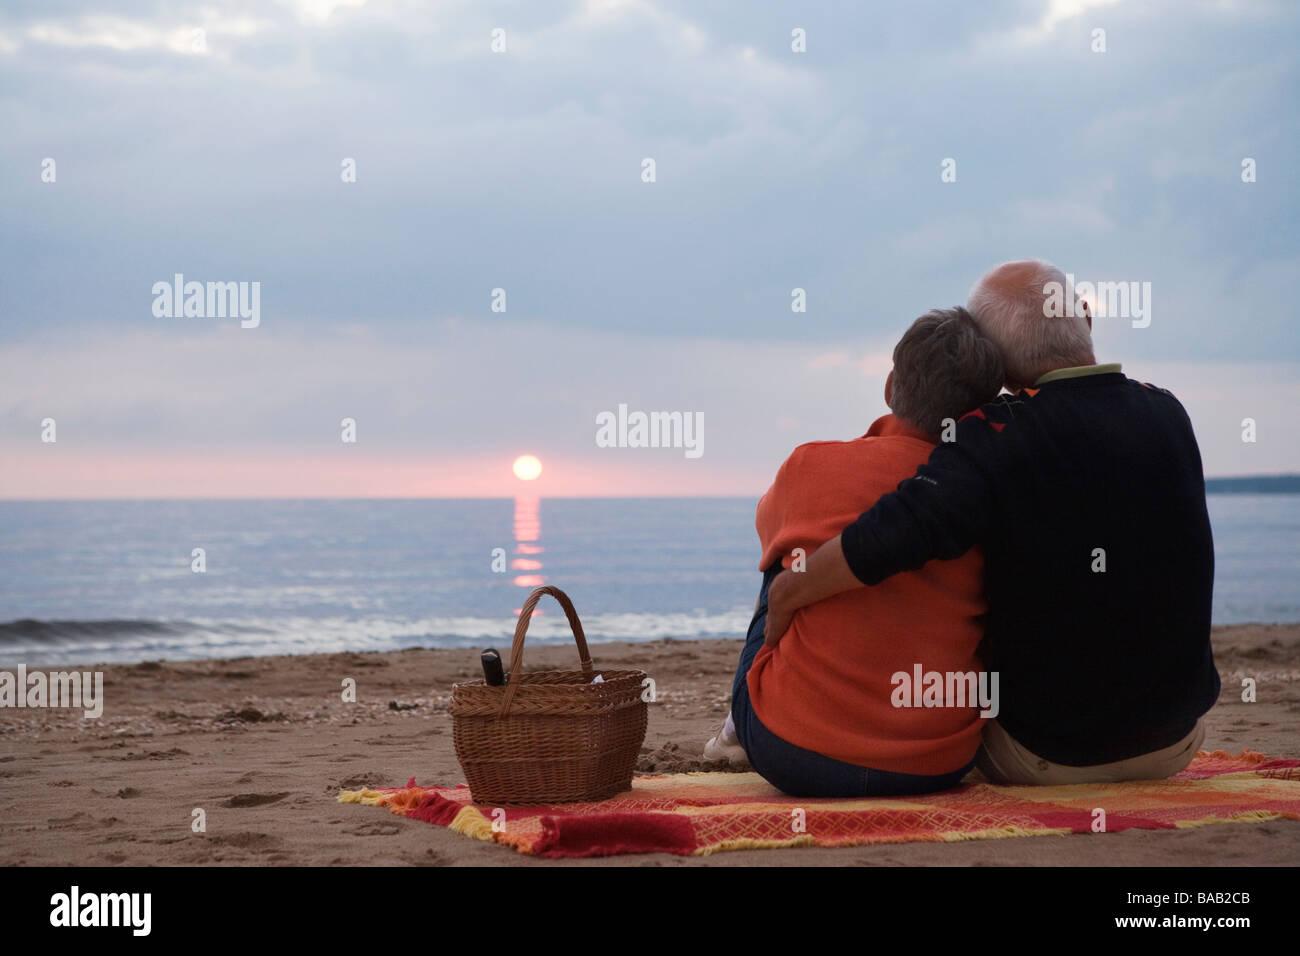 An elderly couple sitting on a beach, Skane, Sweden. - Stock Image